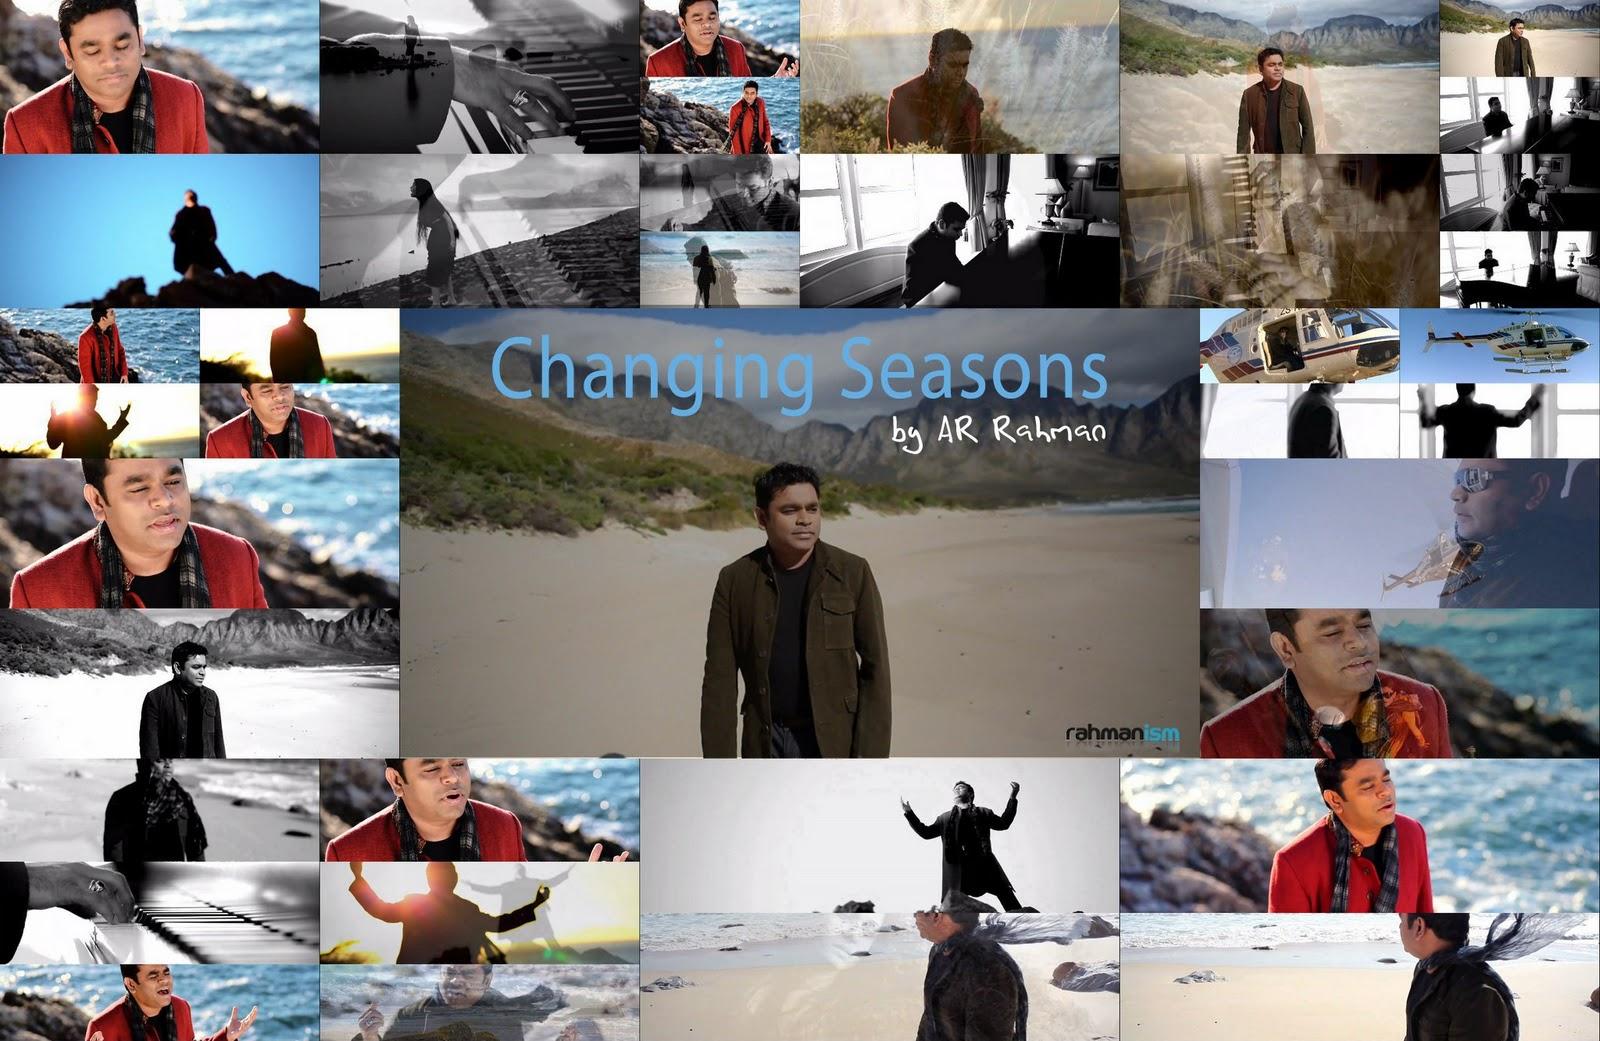 http://2.bp.blogspot.com/-3CG8-FEVs5E/TVi_d9YMbUI/AAAAAAAAFlA/H1T0pFsjs80/s1600/changing_seasons_ar_rahman_telugu_album.jpg